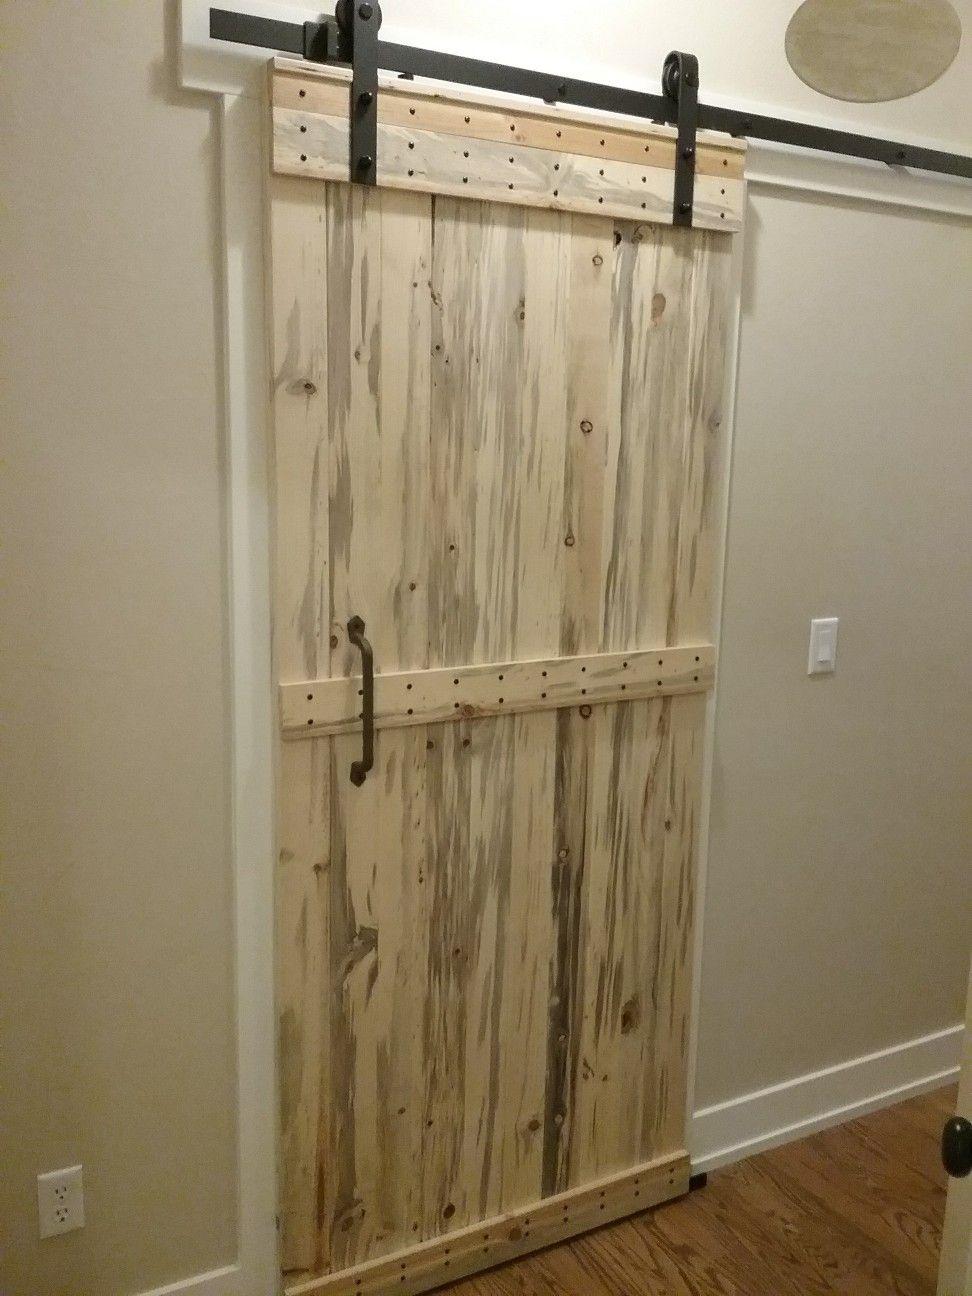 Finally Finished The Barn Door For Ourlaundry Room Svw House Beetles Barn Door Doors